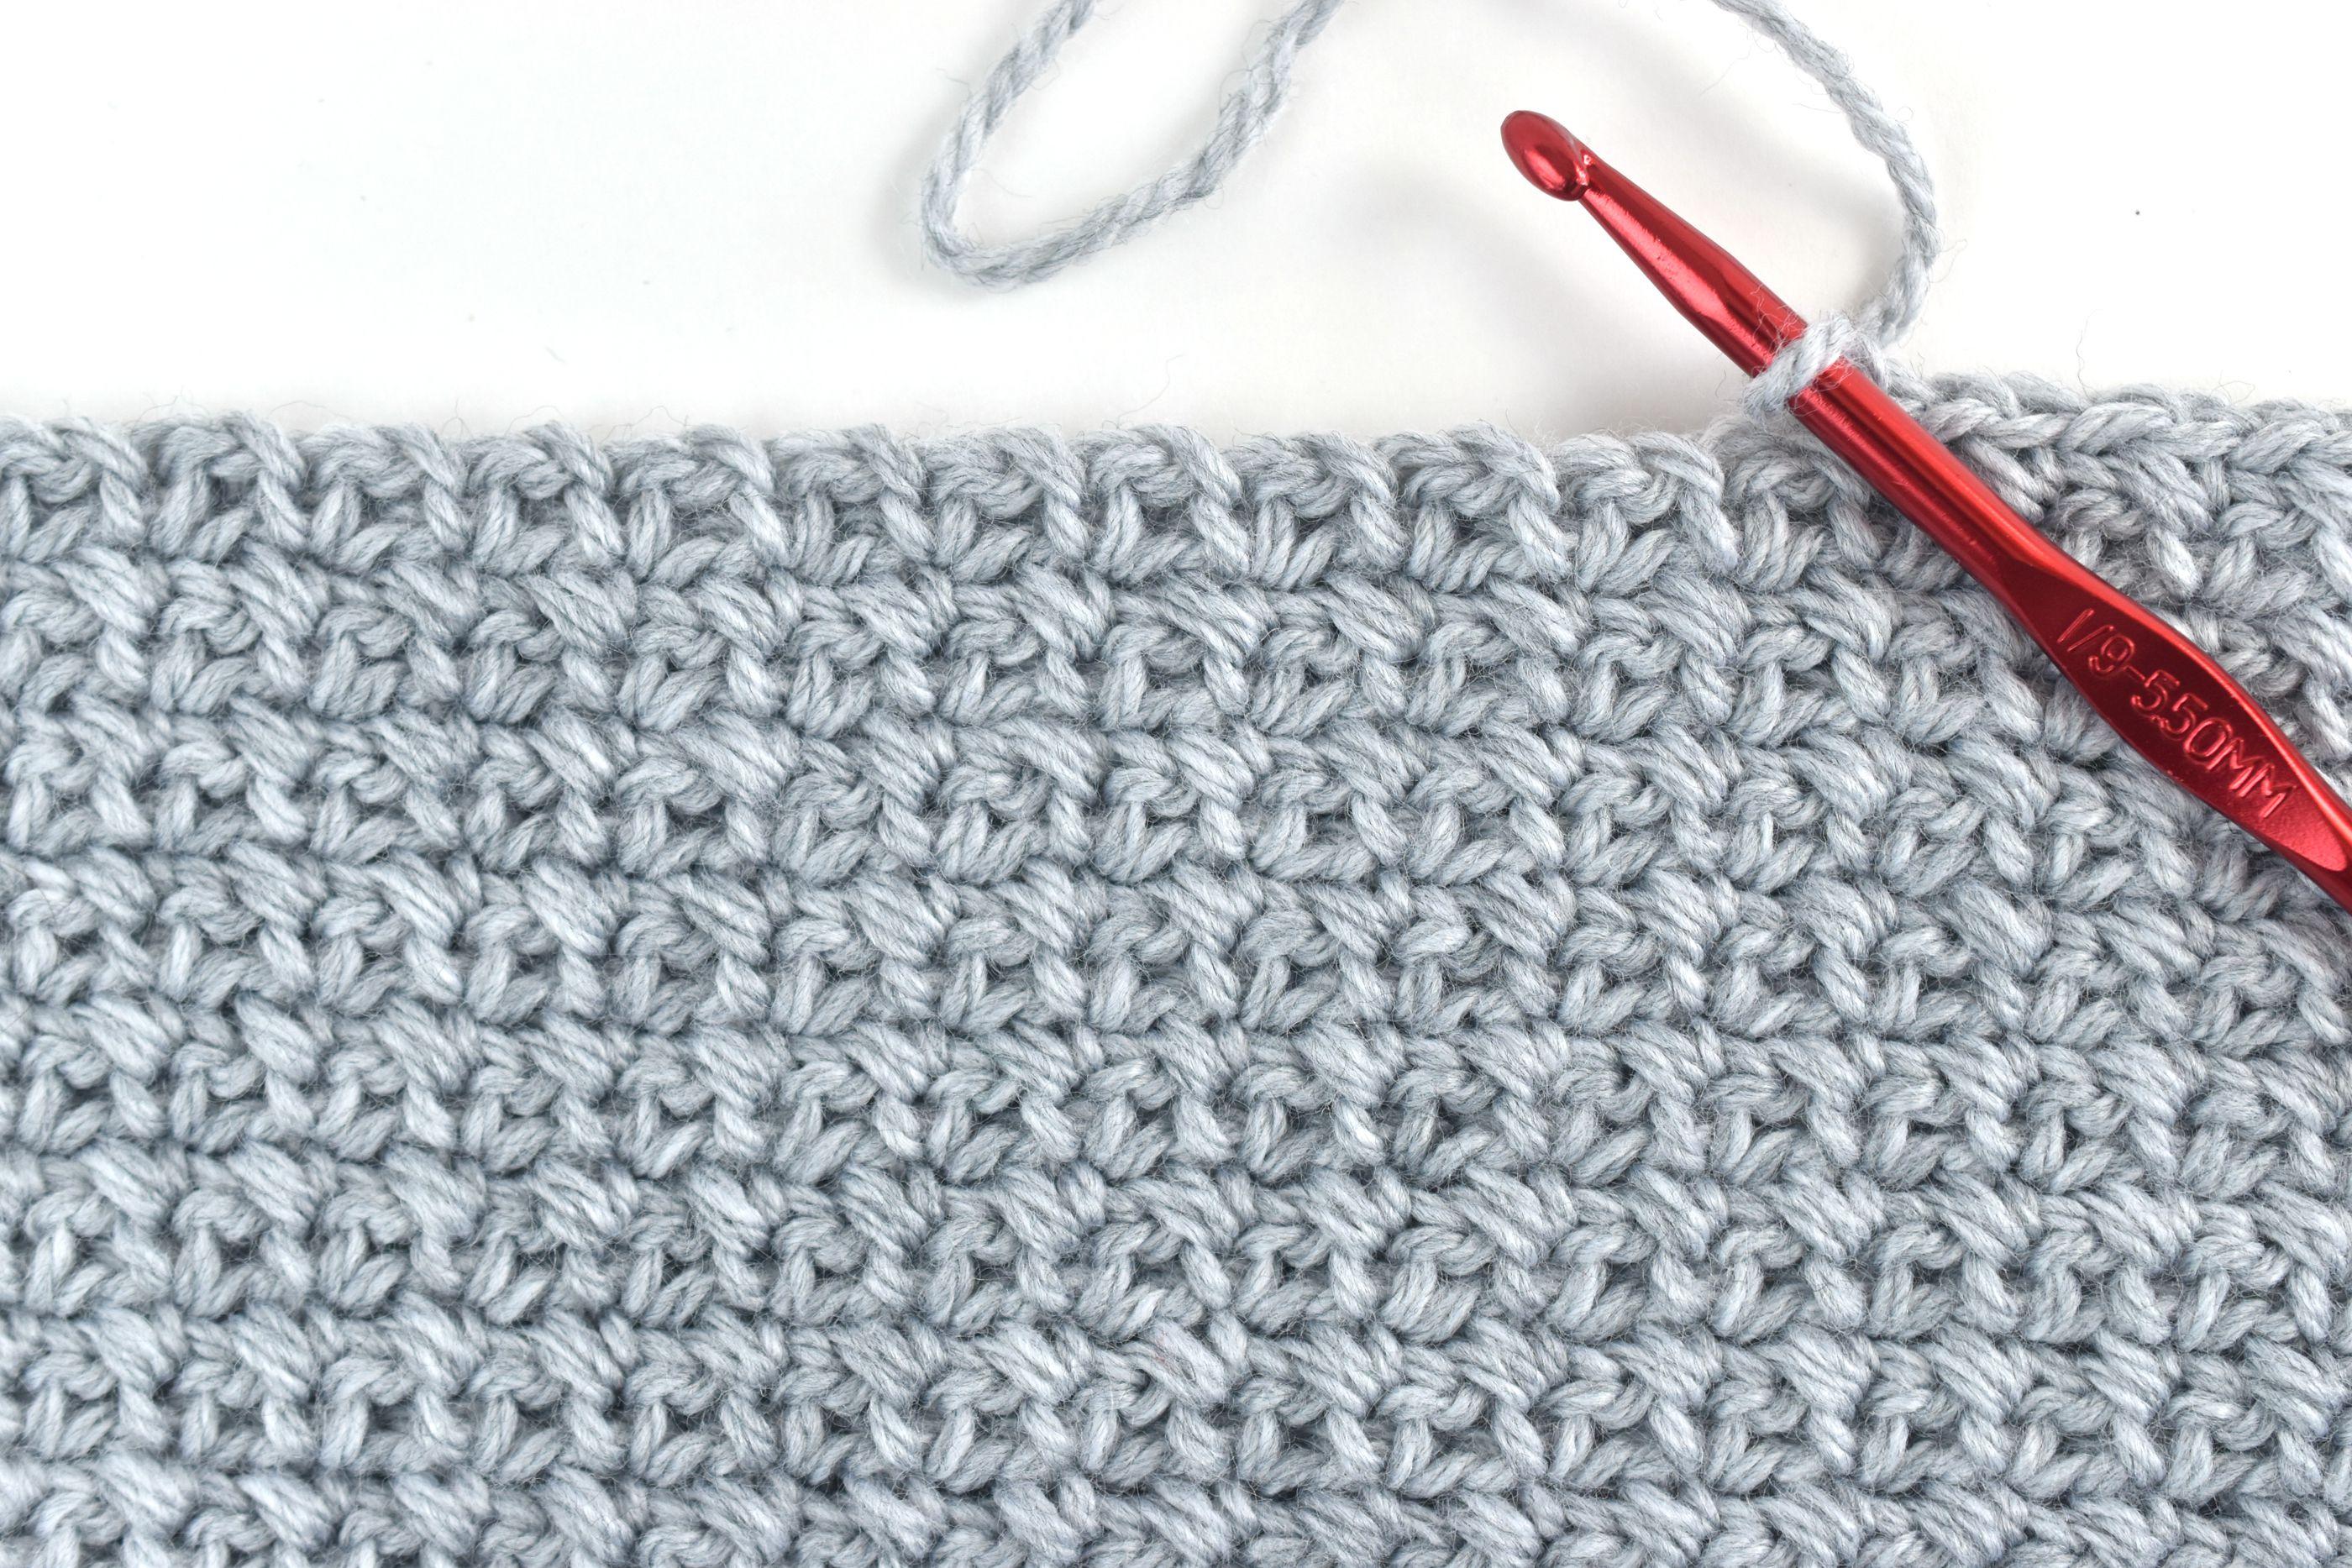 Easy Baby Blanket Crochet Patterns For Beginners Fast Free Easy ...